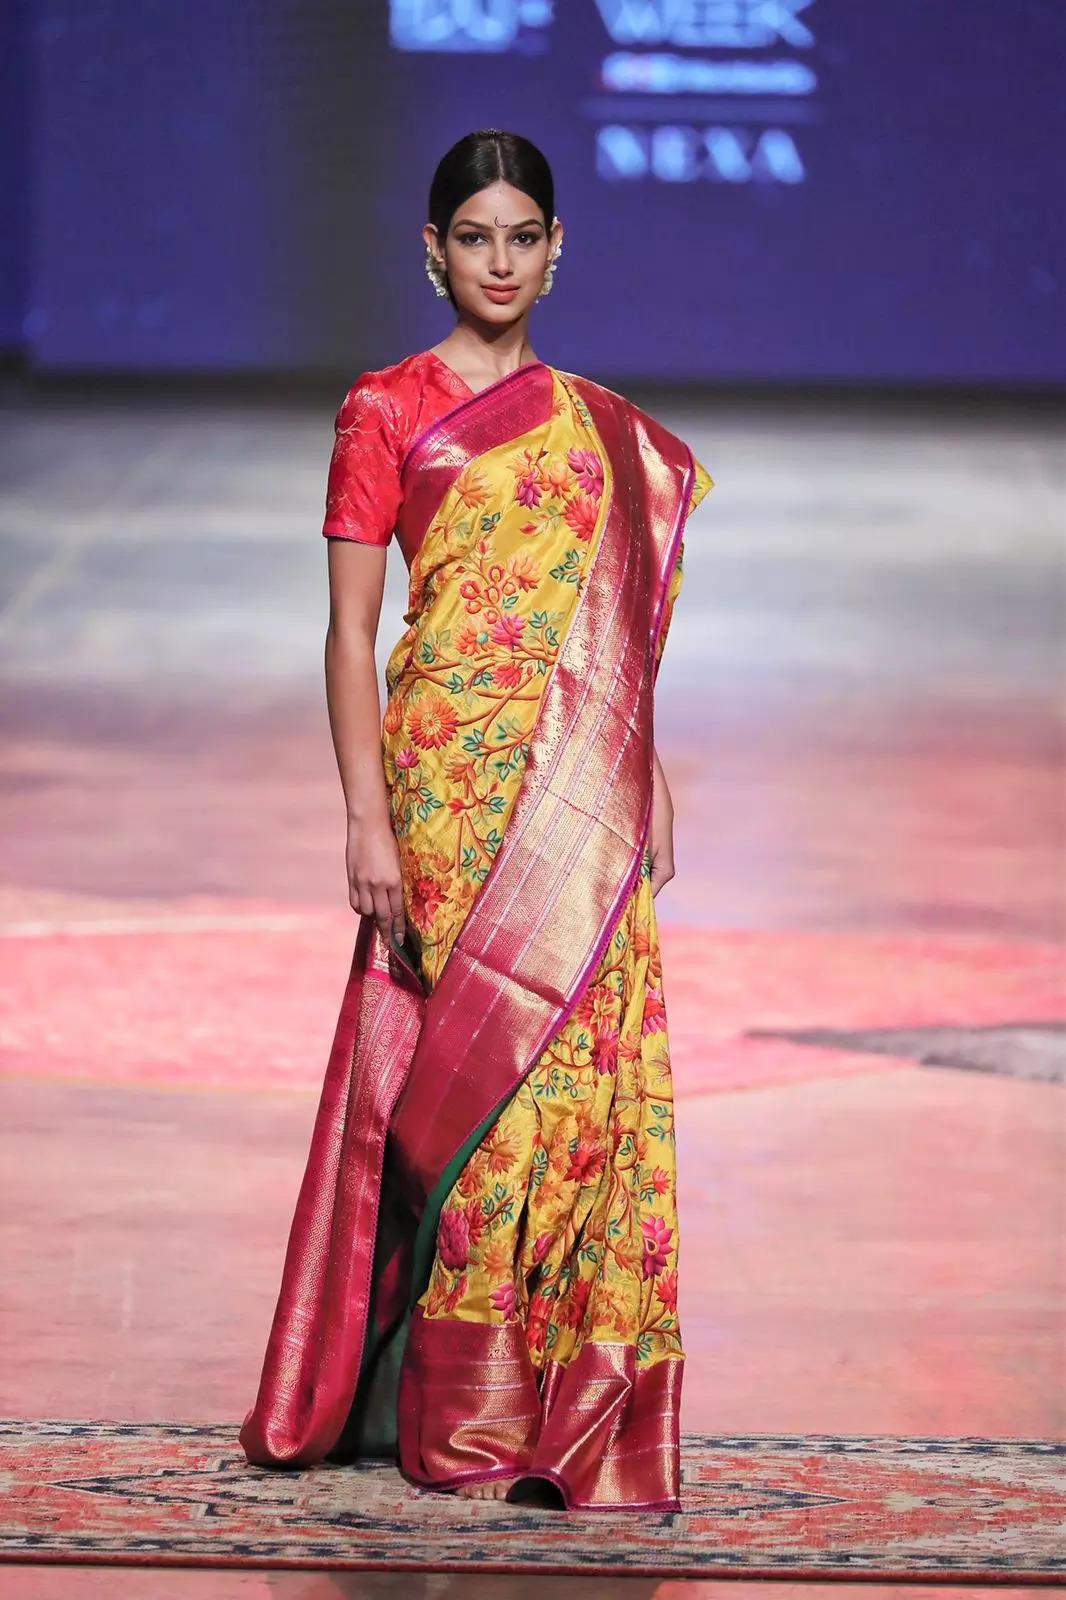 Harnaaz Sandhu looked mesmerizing as she graced the ramp at FDCI x Lakmé Fashion Week